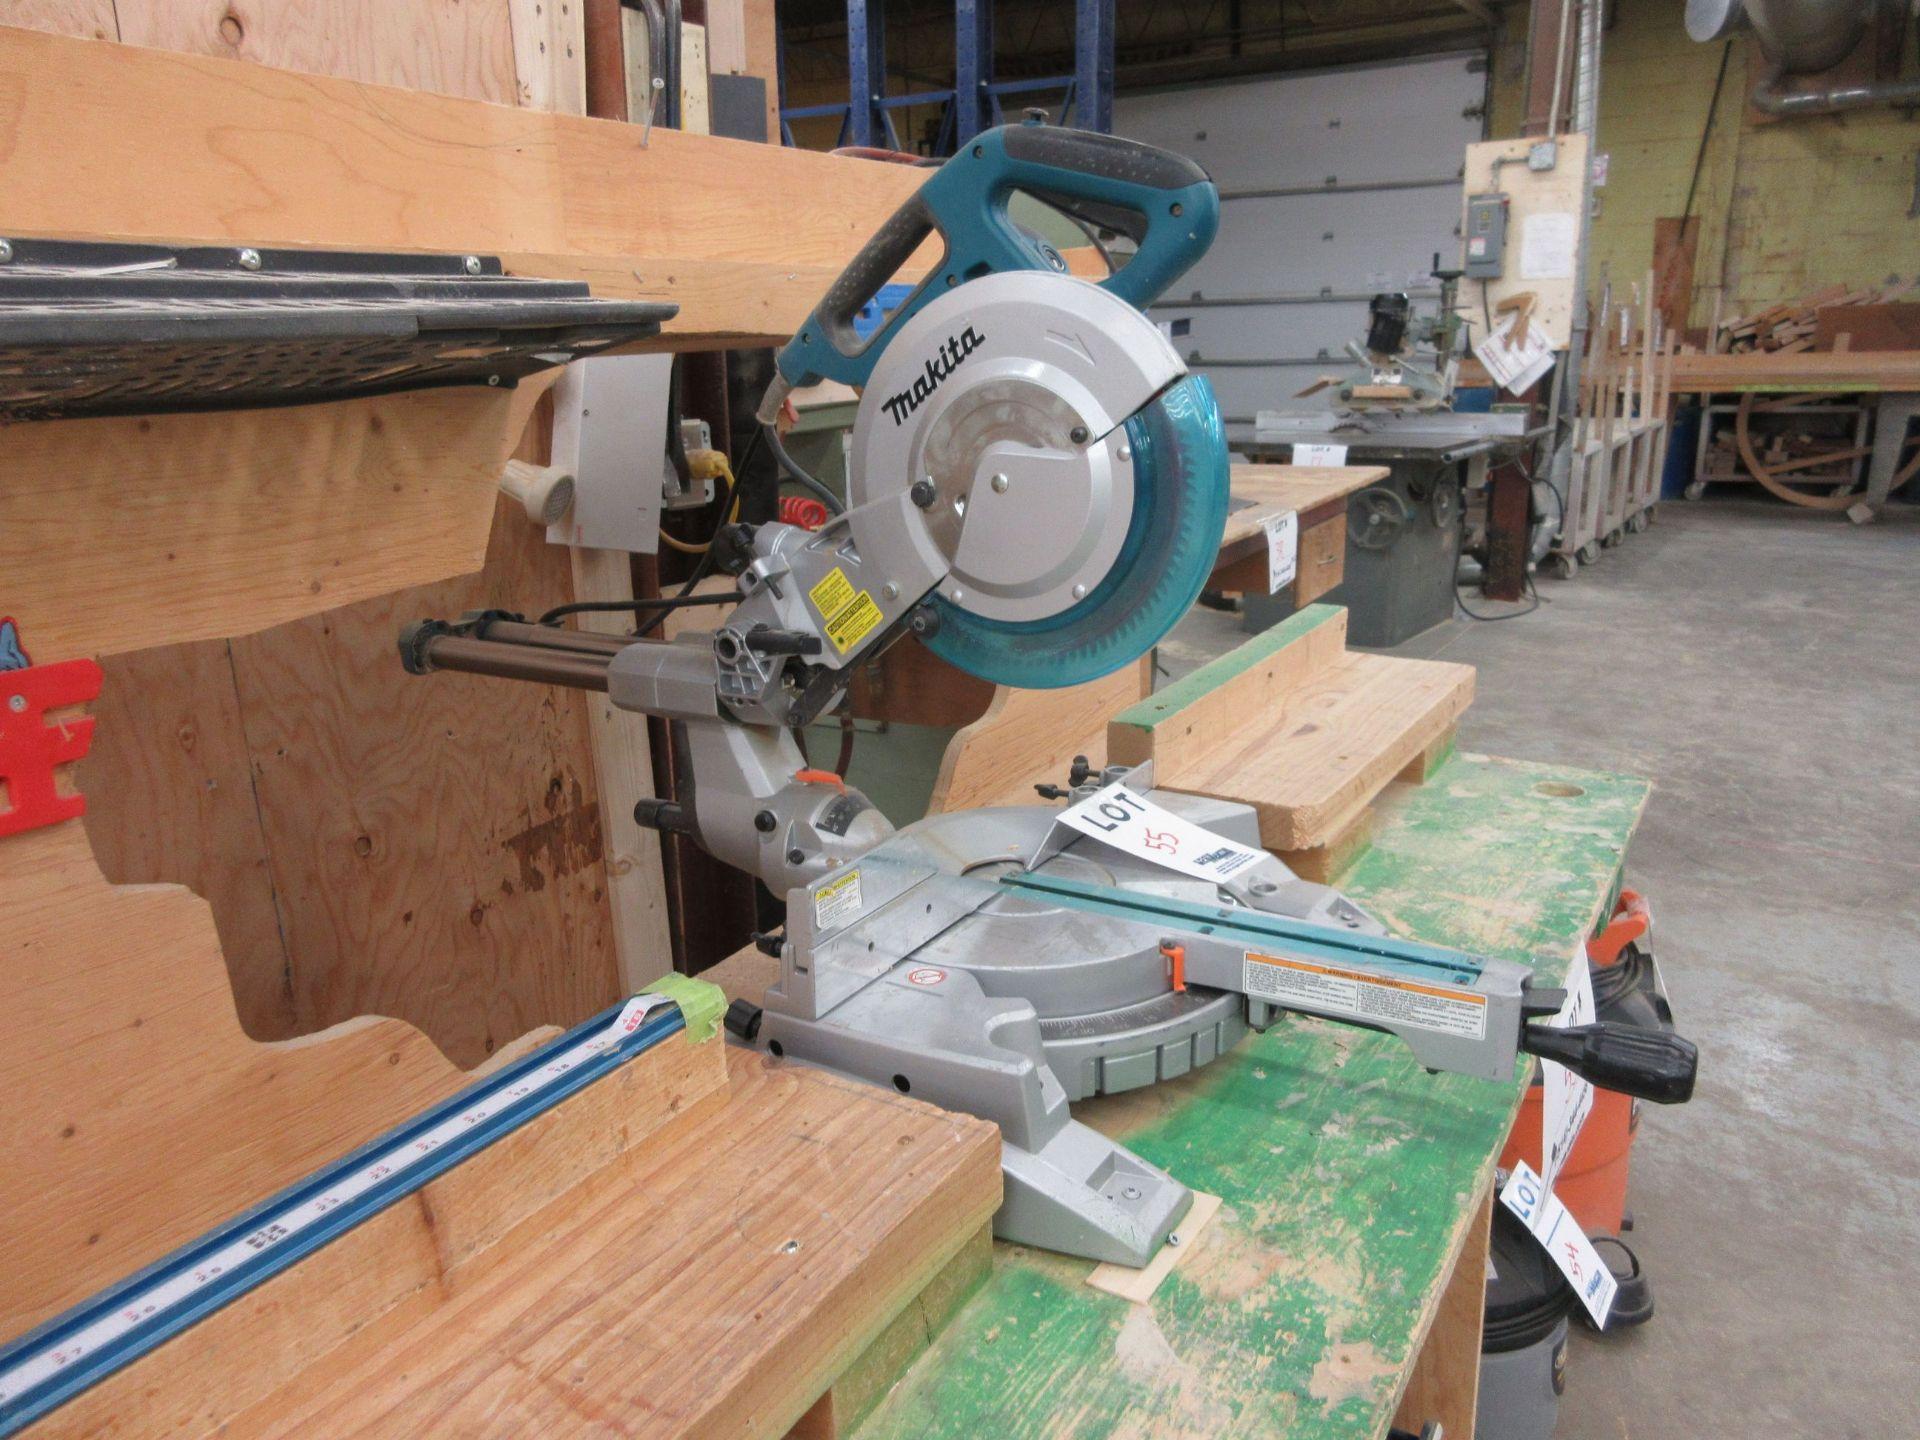 MAKITA miter saw, Mod: LS1018L c/w work table - Image 2 of 5